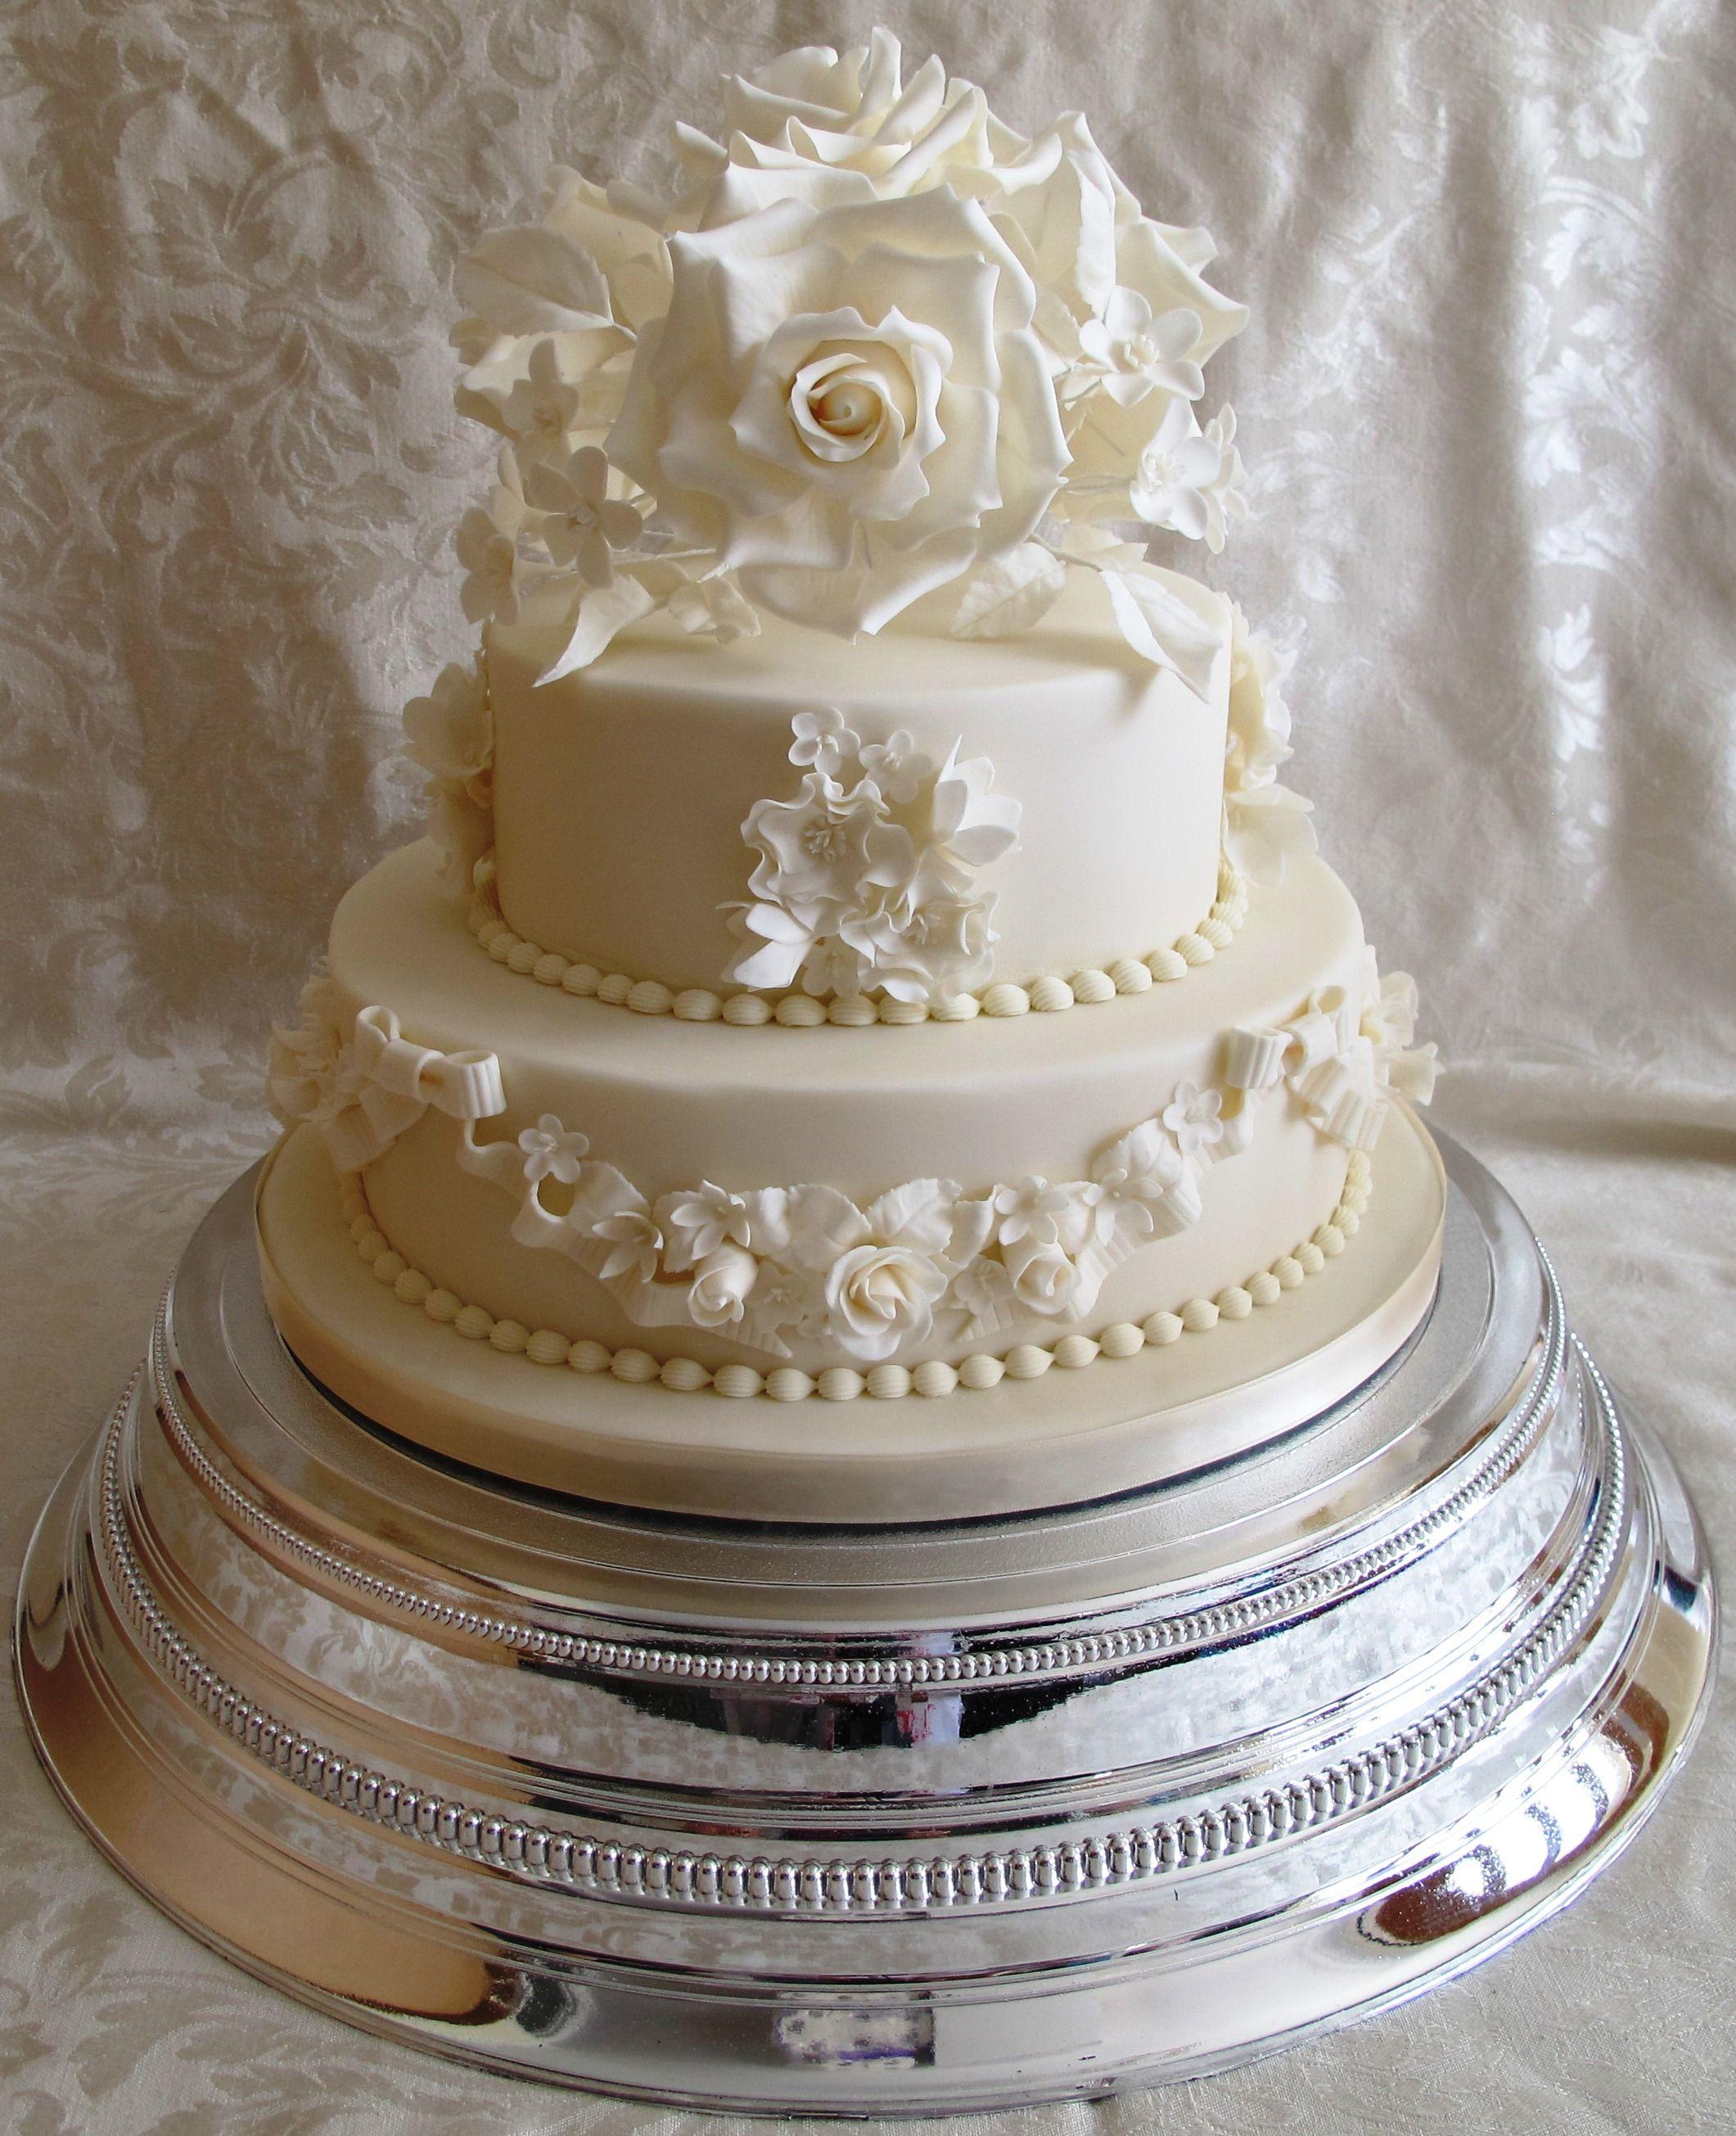 Vintage 2 Tier Wedding Cake Vintage 2 Tier Wedding Cake With Sugar Flowers Round Wedding Cakes 2 Tier Wedding Cakes Traditional Wedding Cakes